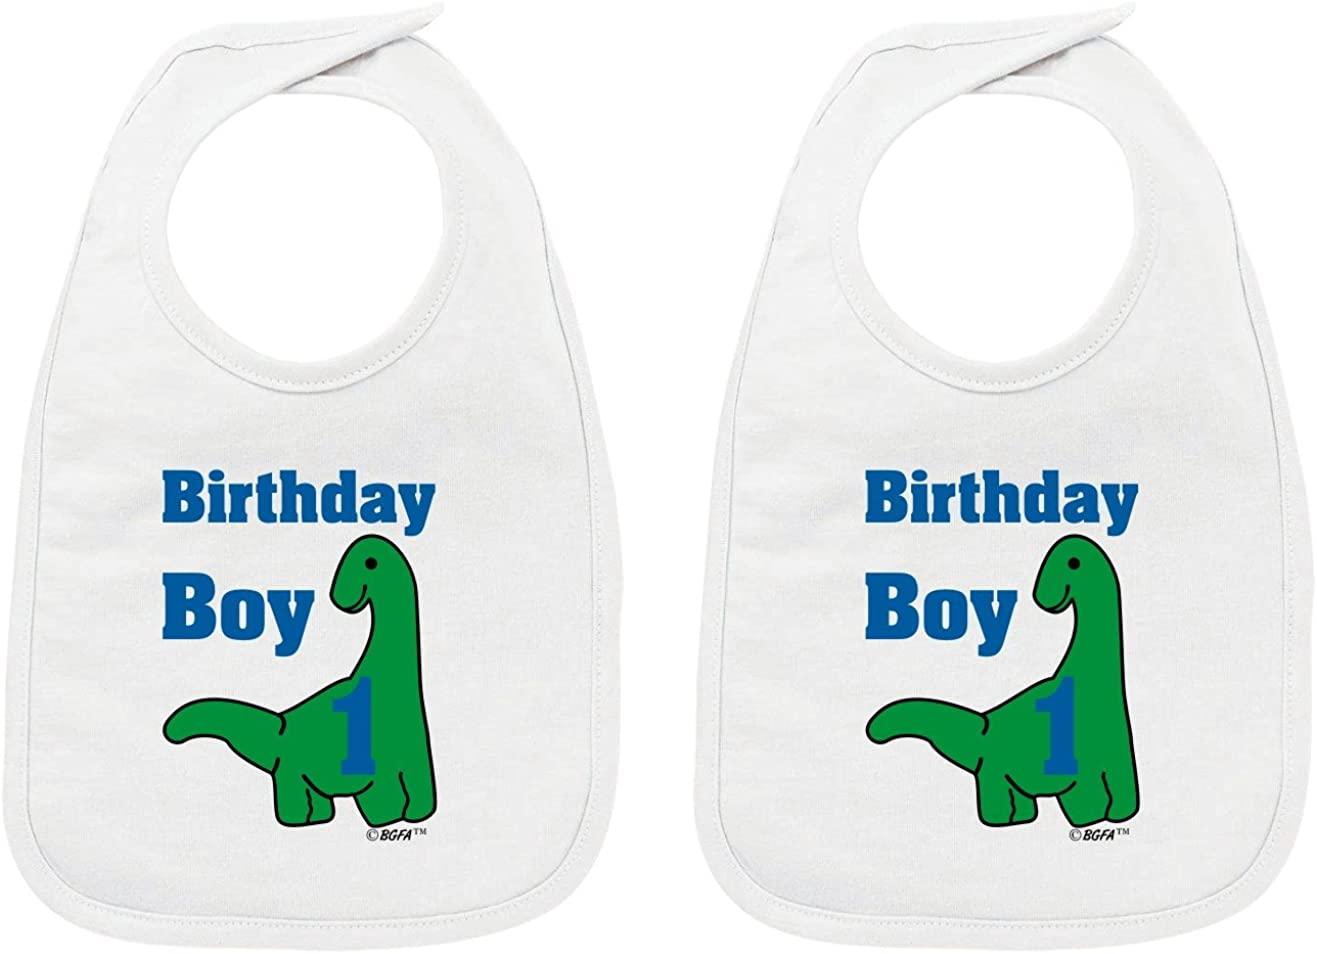 Baby Gifts For All 1st Birthday Gift Dinosaur Birthday Boy Baby Bib